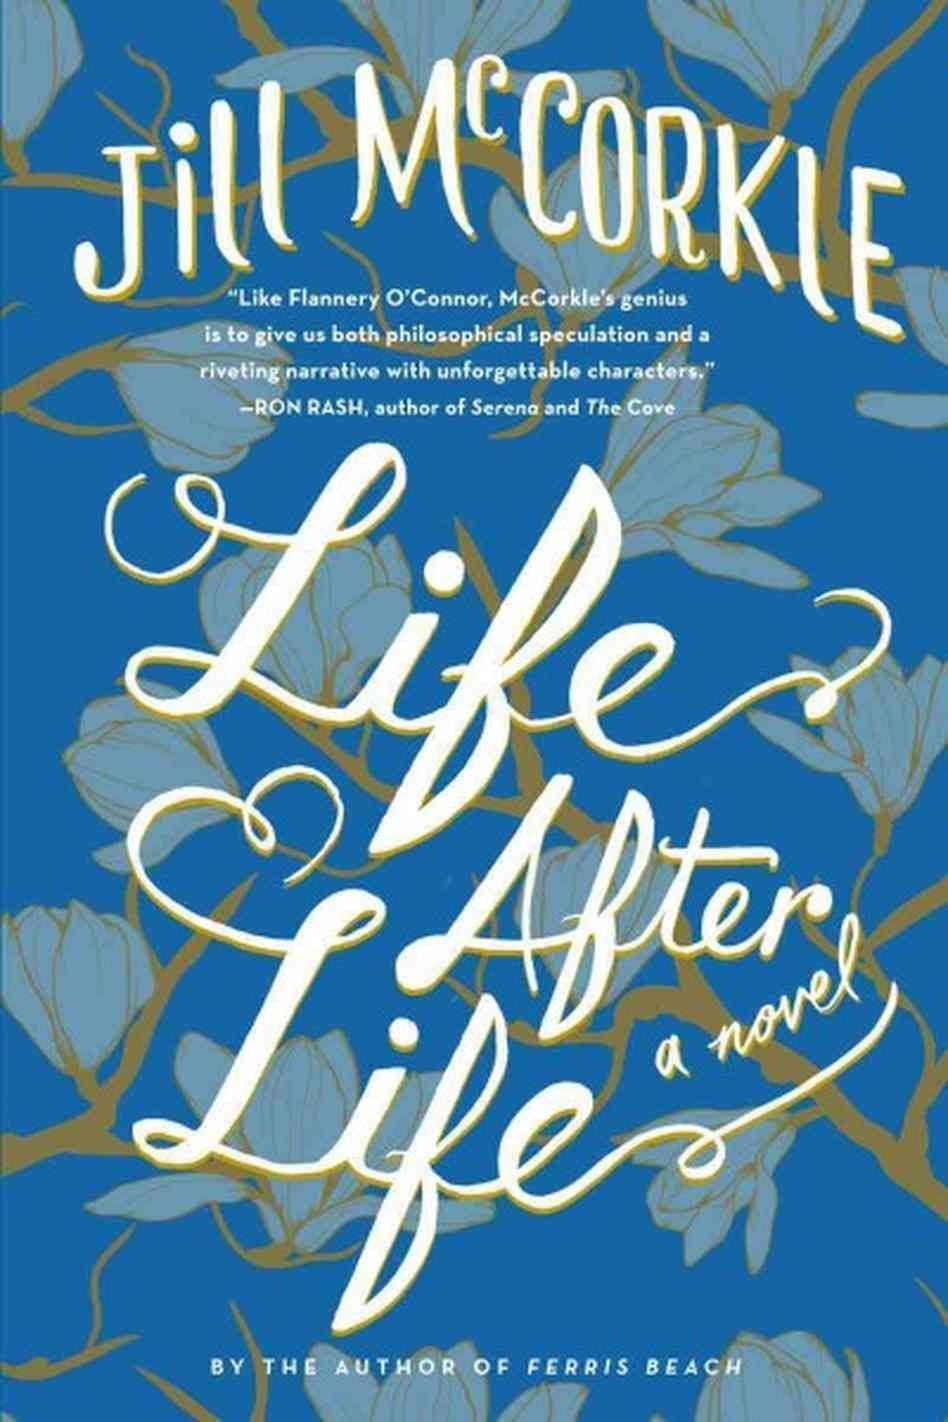 Jill McCorkle's latest novel!!